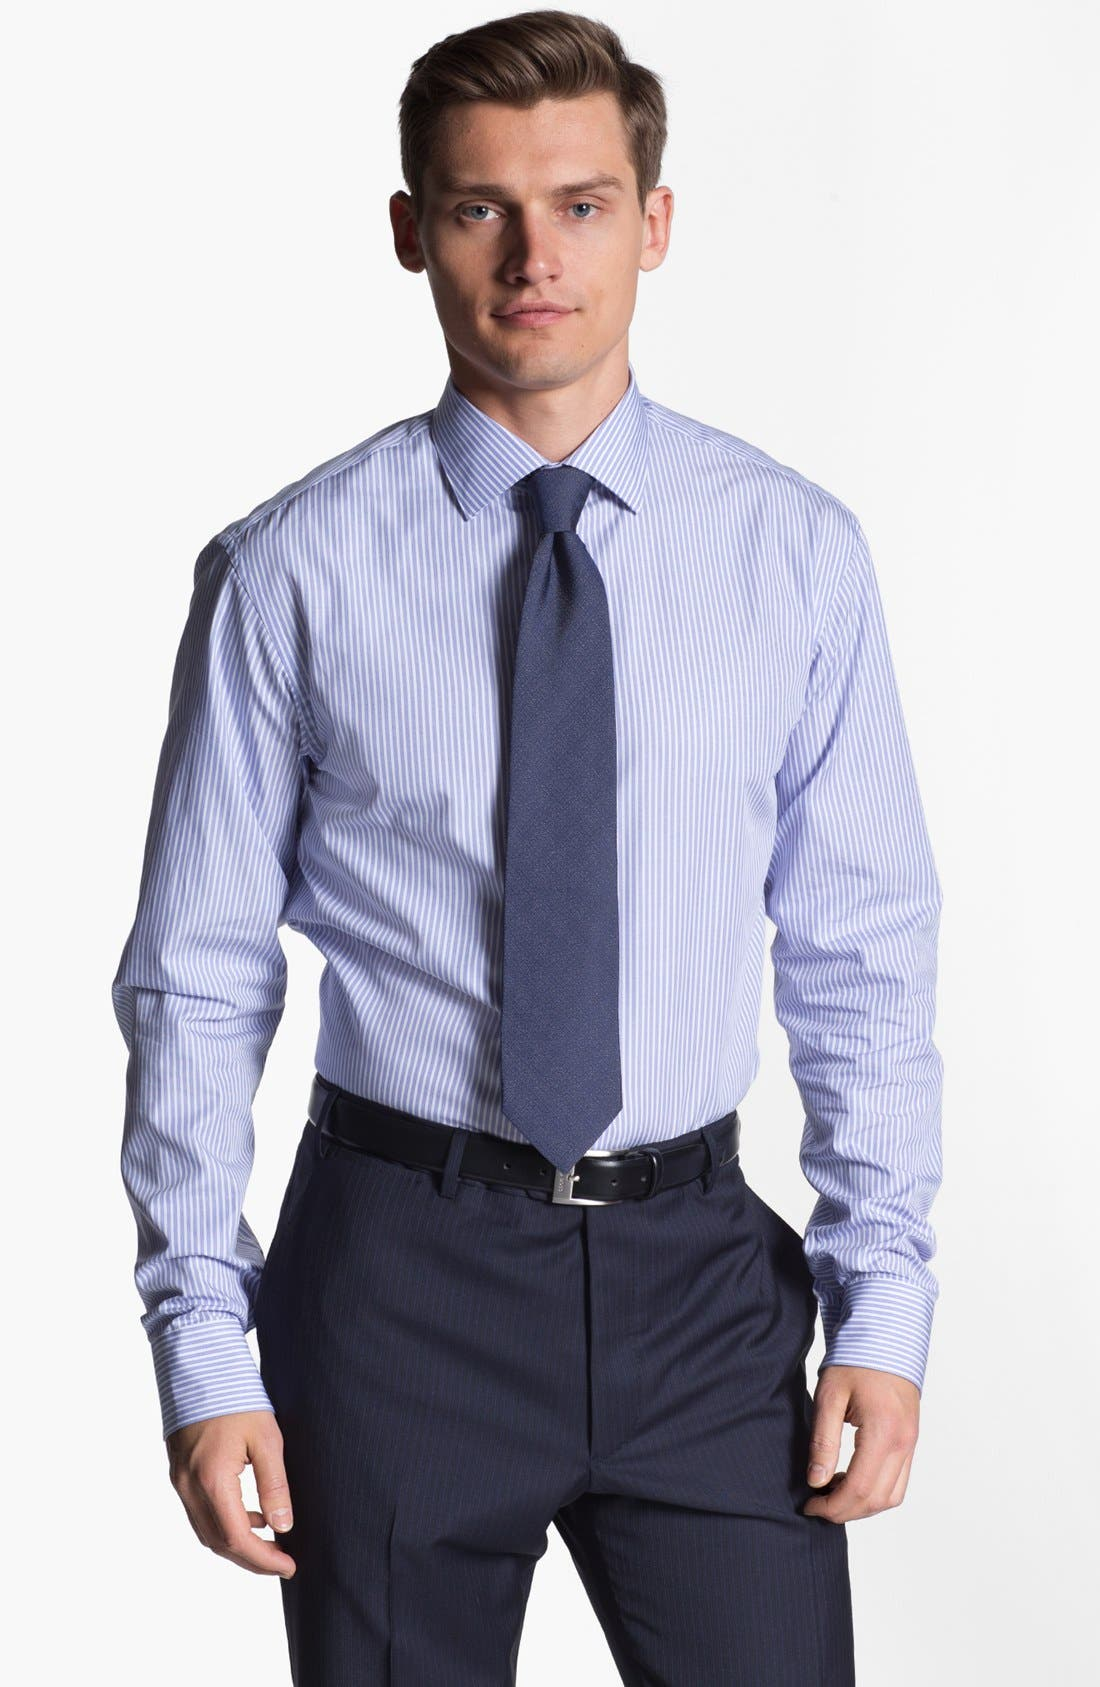 Main Image - Armani Collezioni Trim Fit Stripe Cotton Dress Shirt